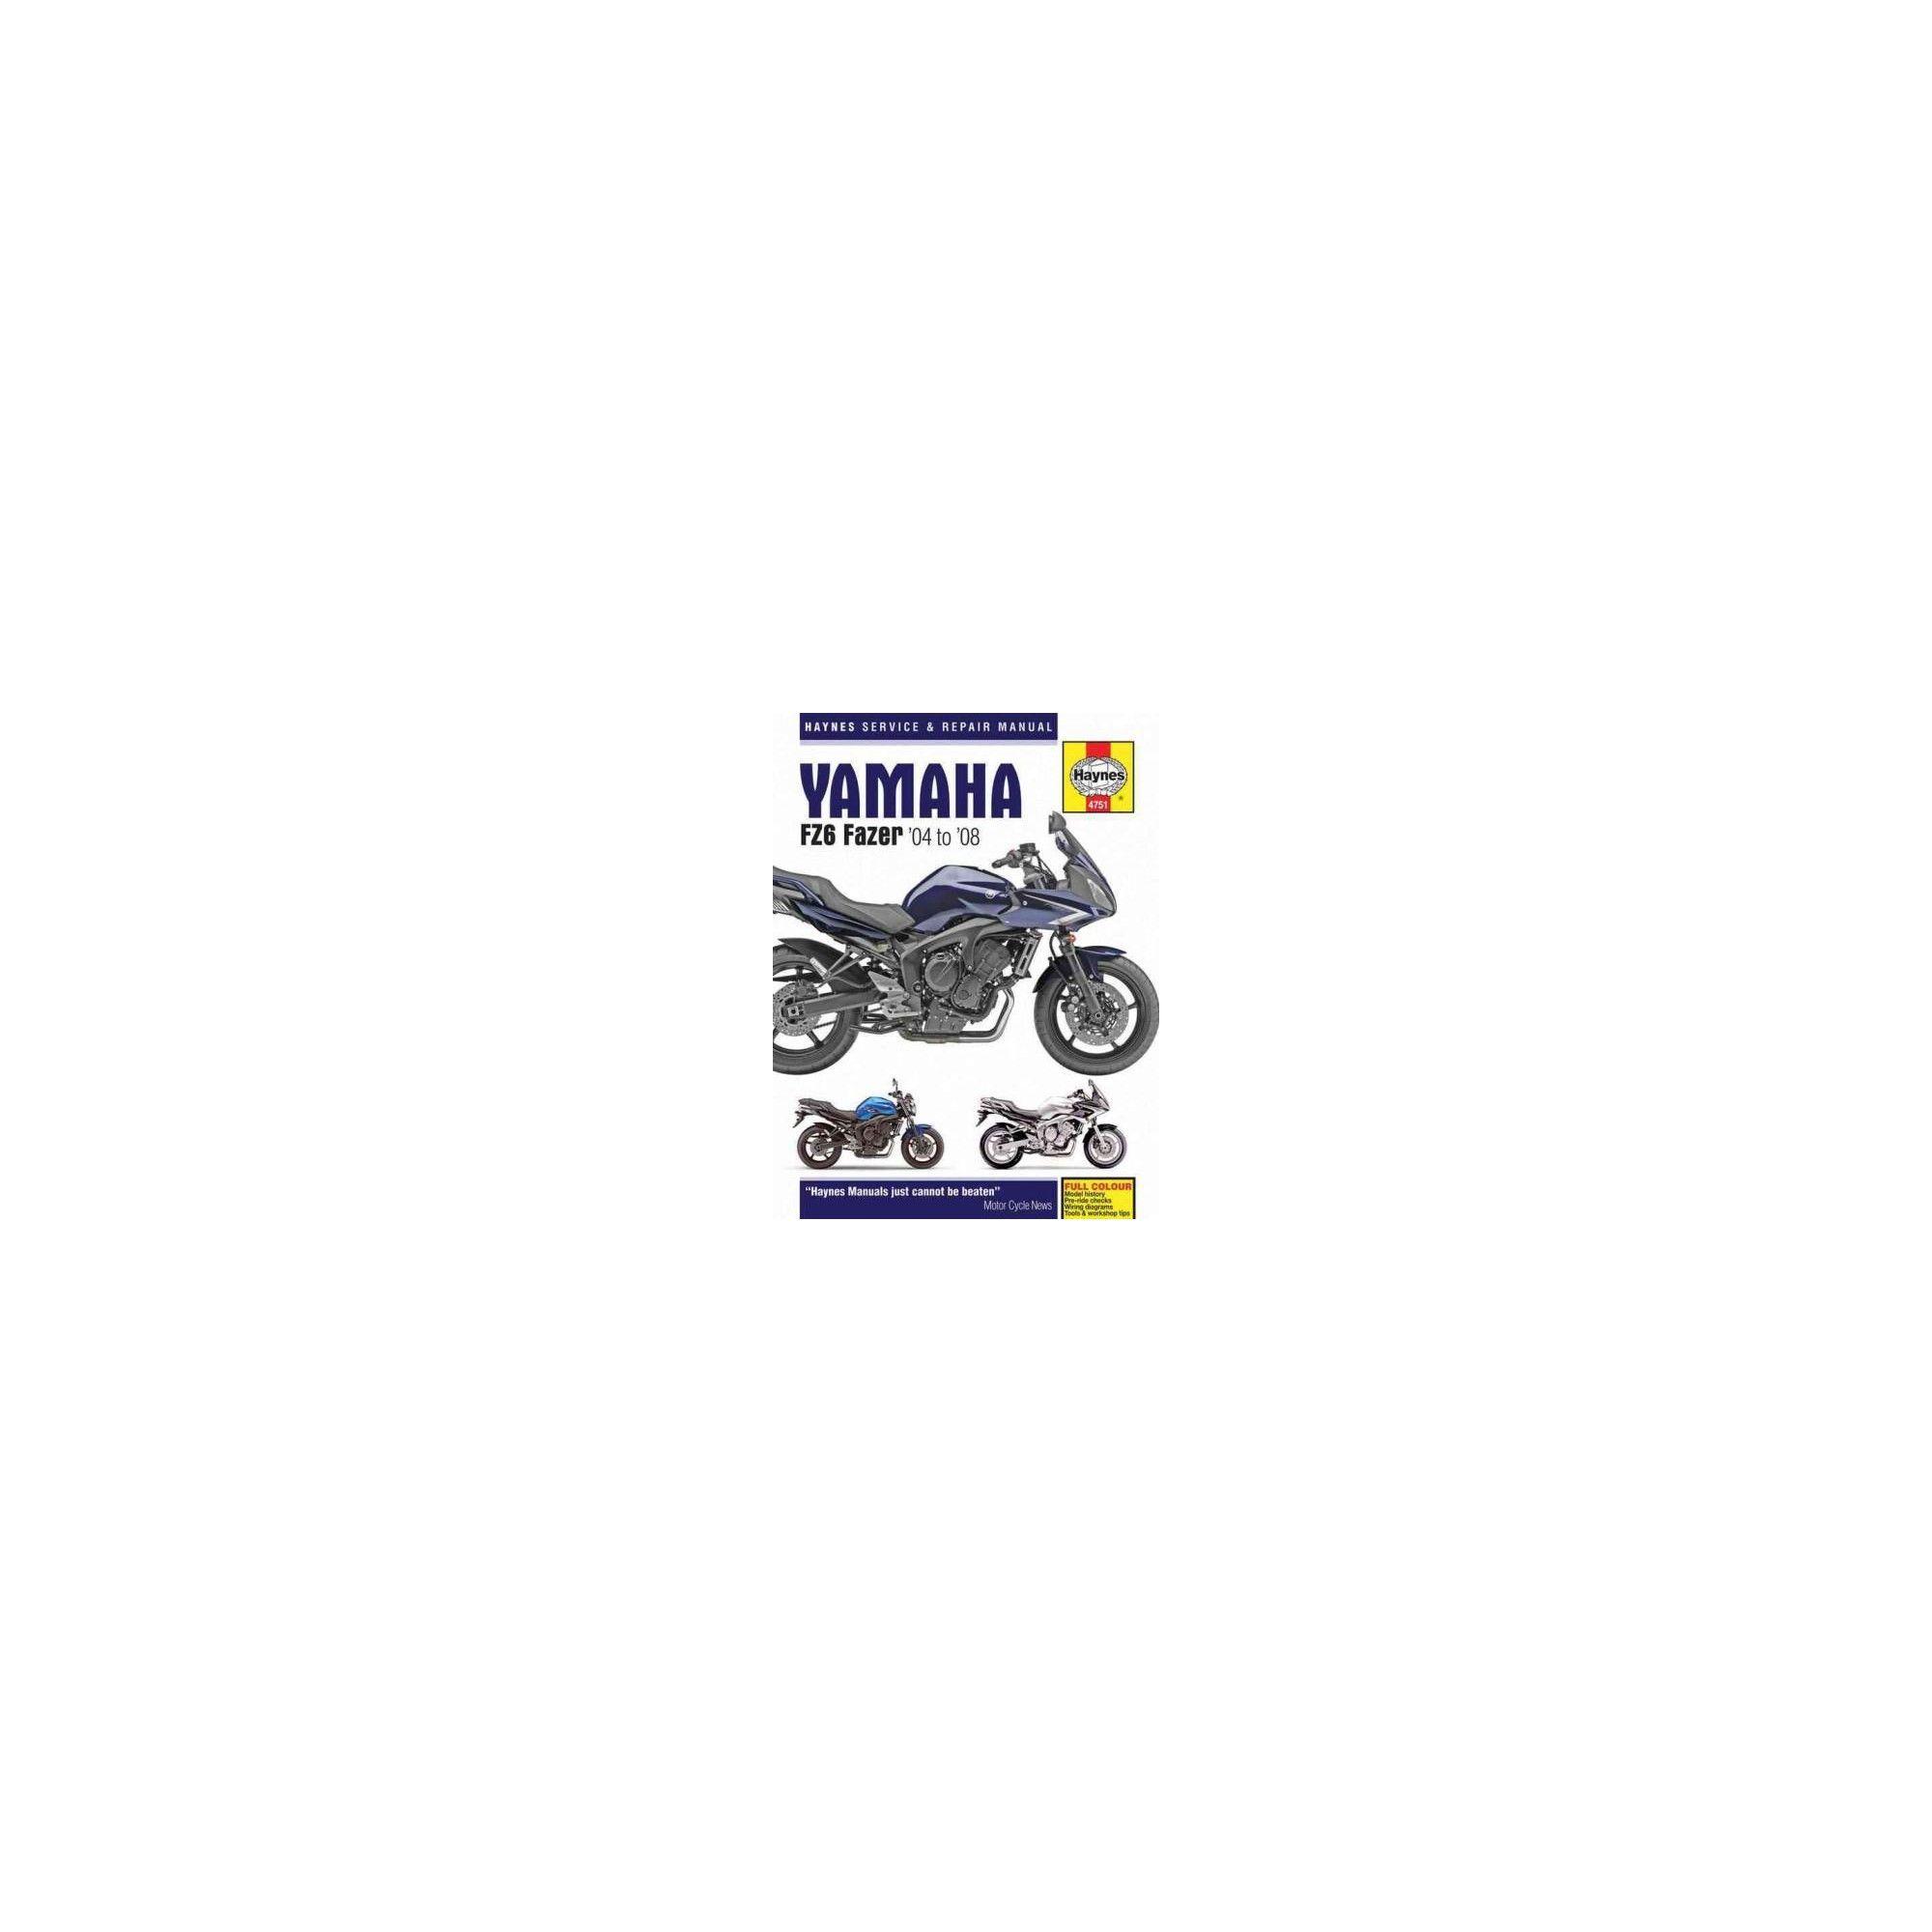 Haynes Yamaha FZ6 Fazer '04 to '08 Service and Repair Manual (Paperback)